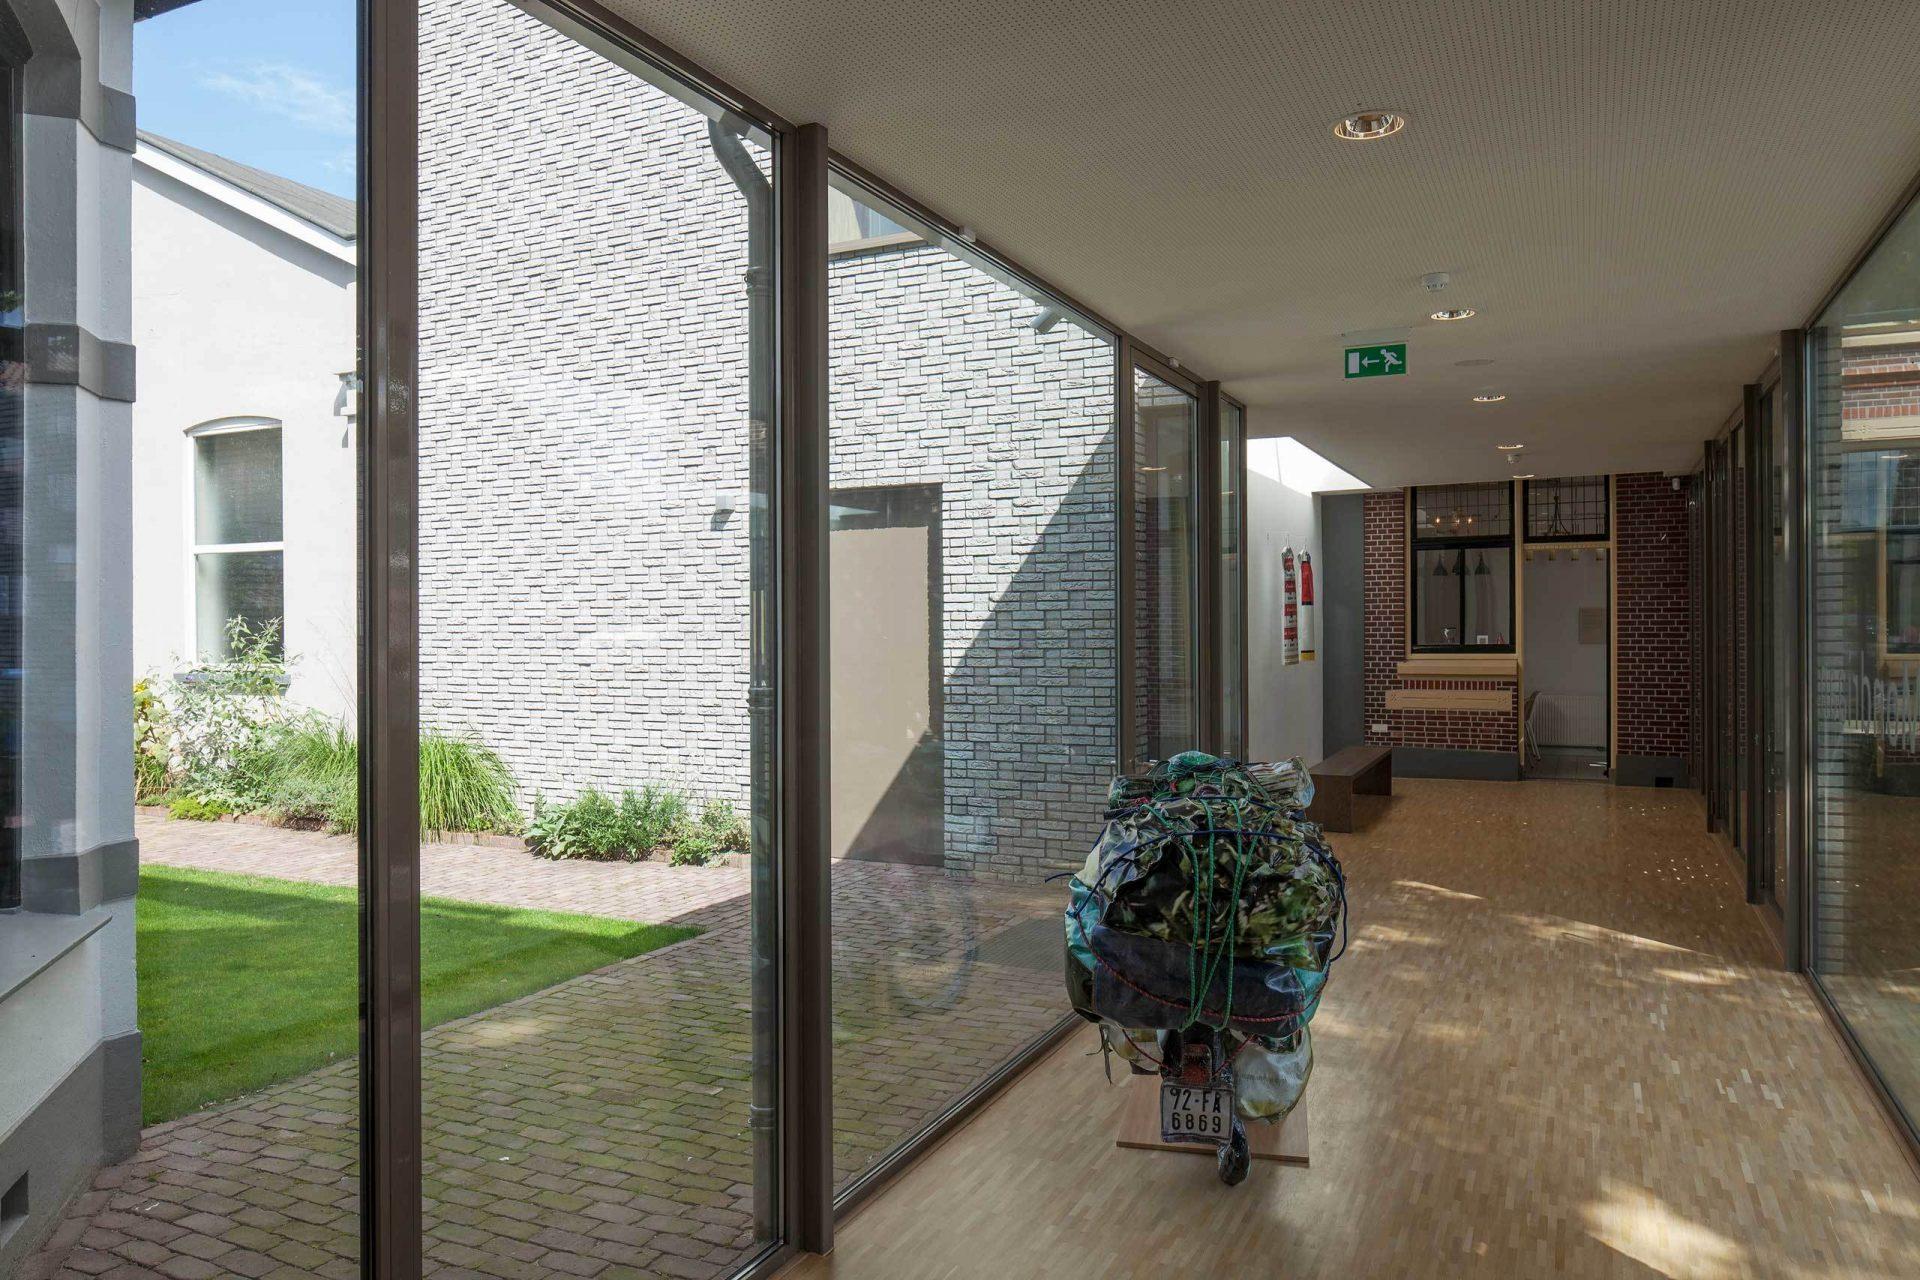 Mondrian Corridor